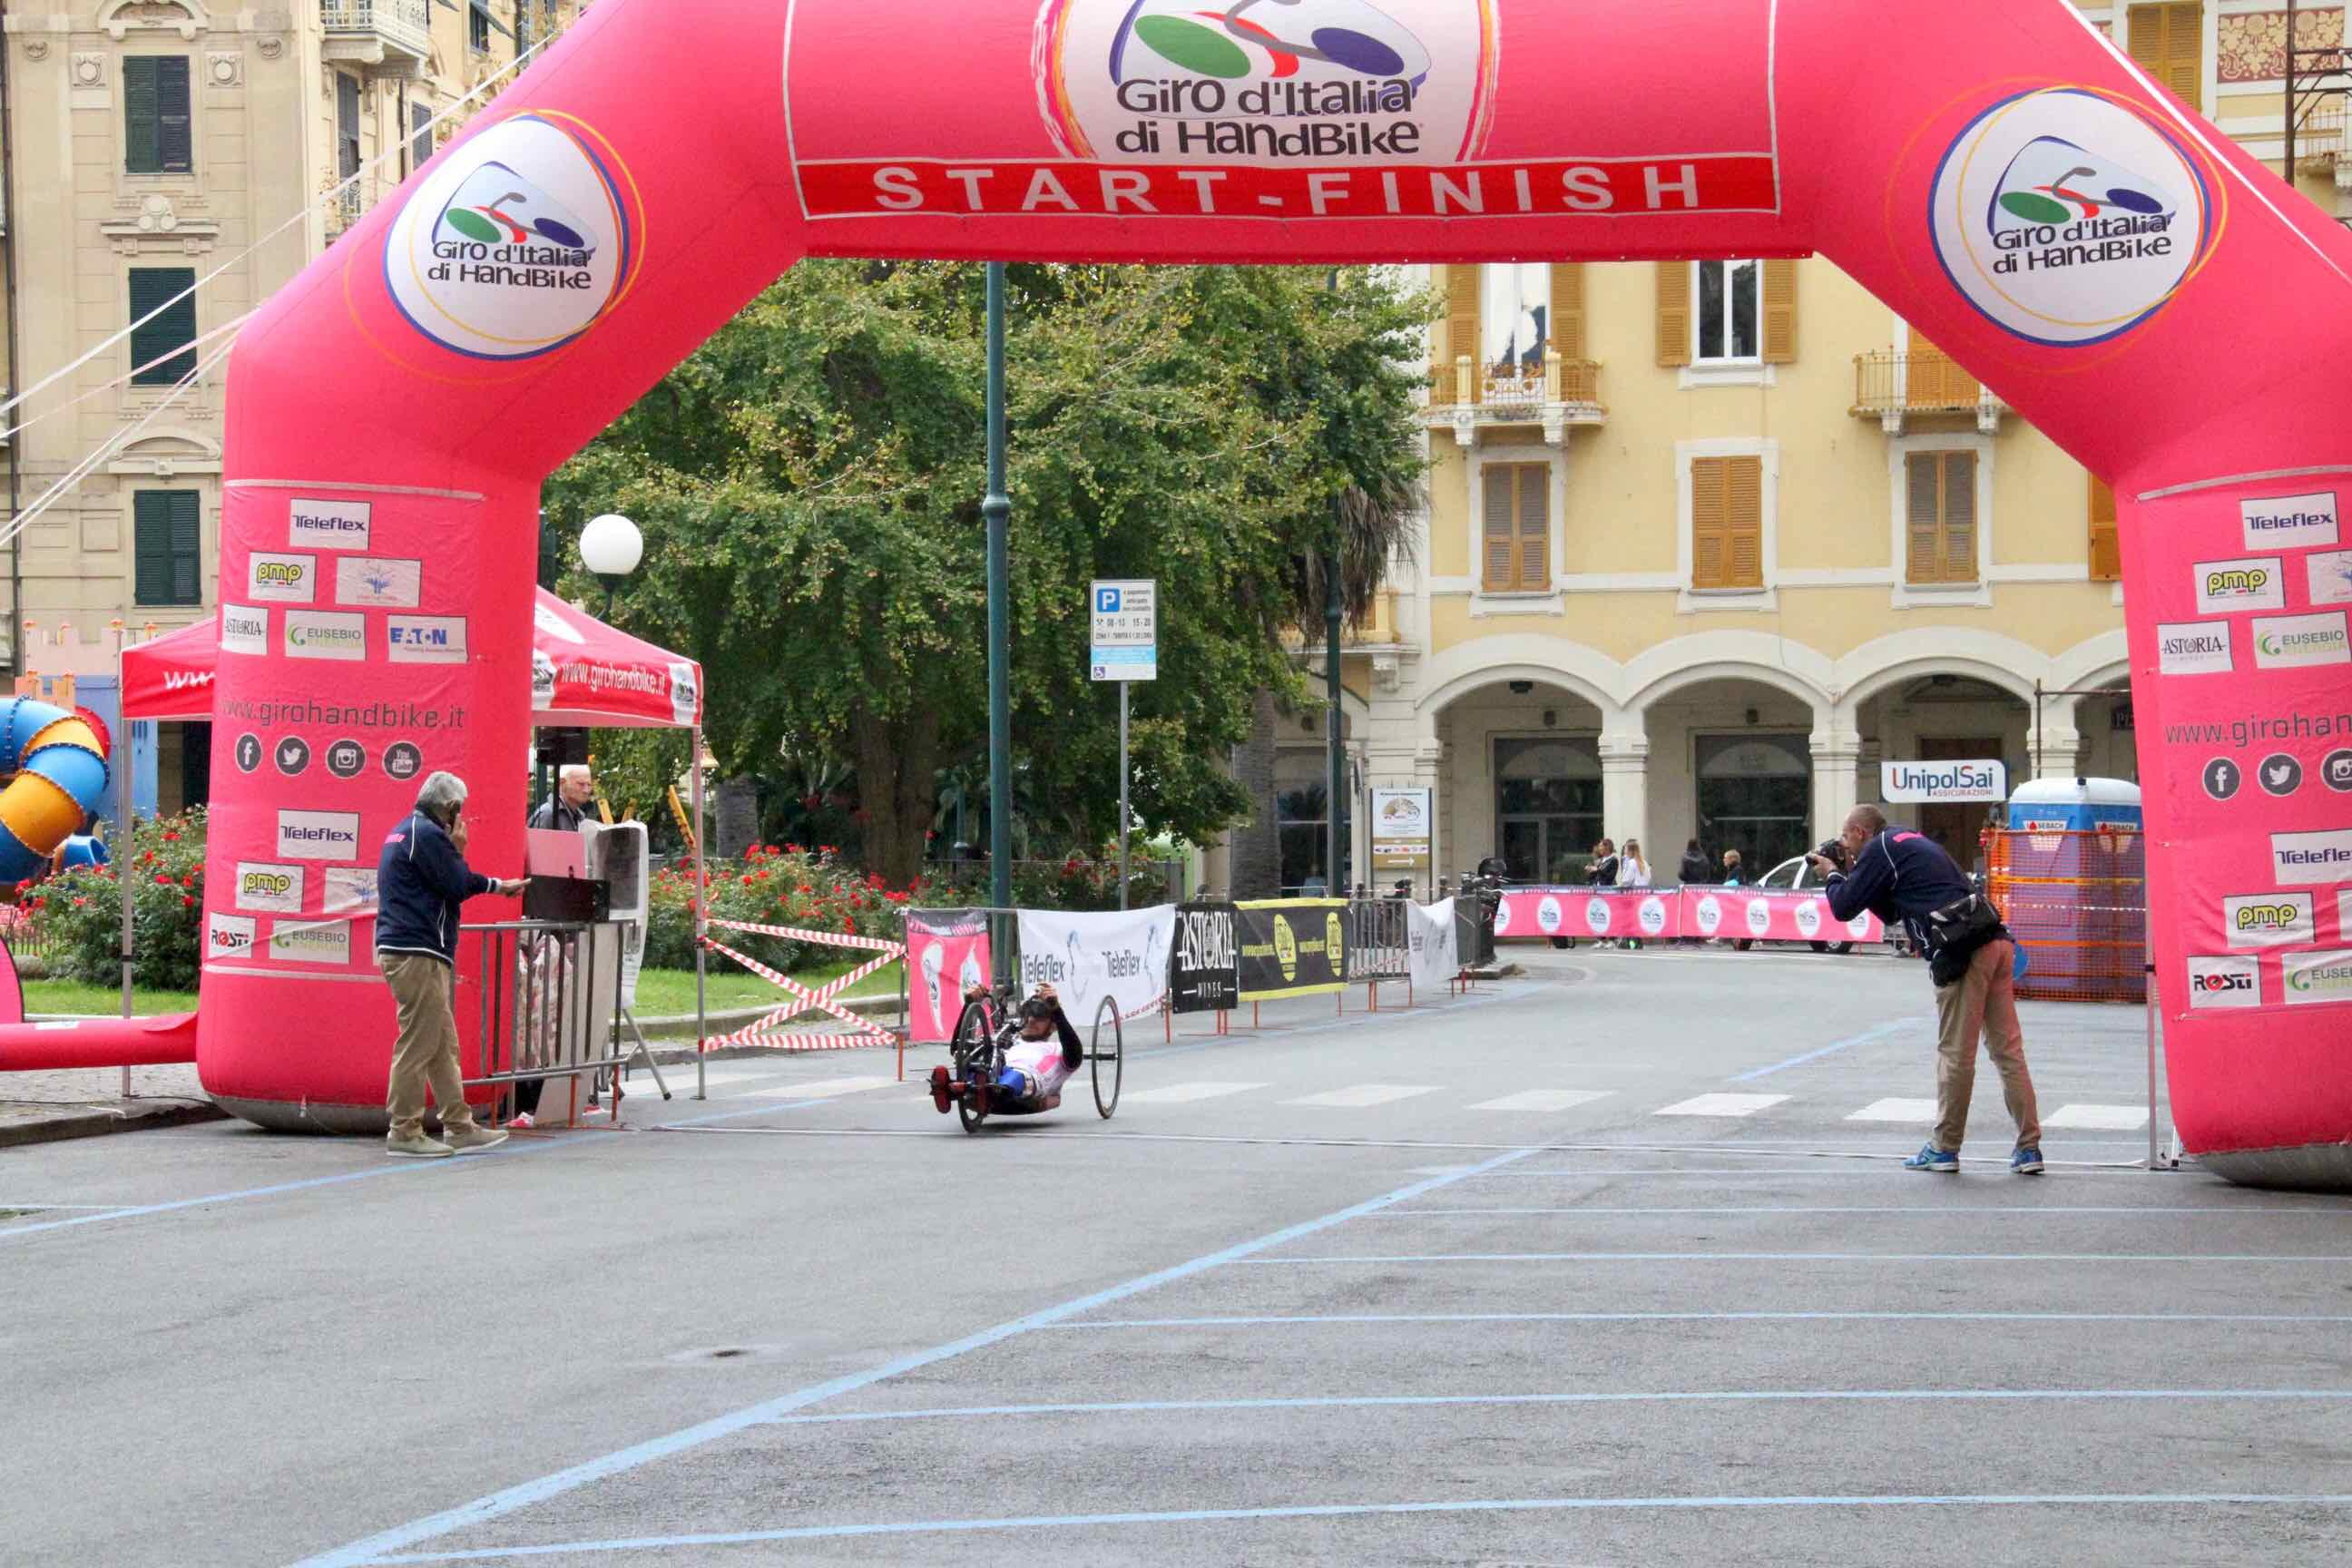 1° Memorial don Nando Negri a Chiavari per il Giro d'Italia Handbike 2018 - 2